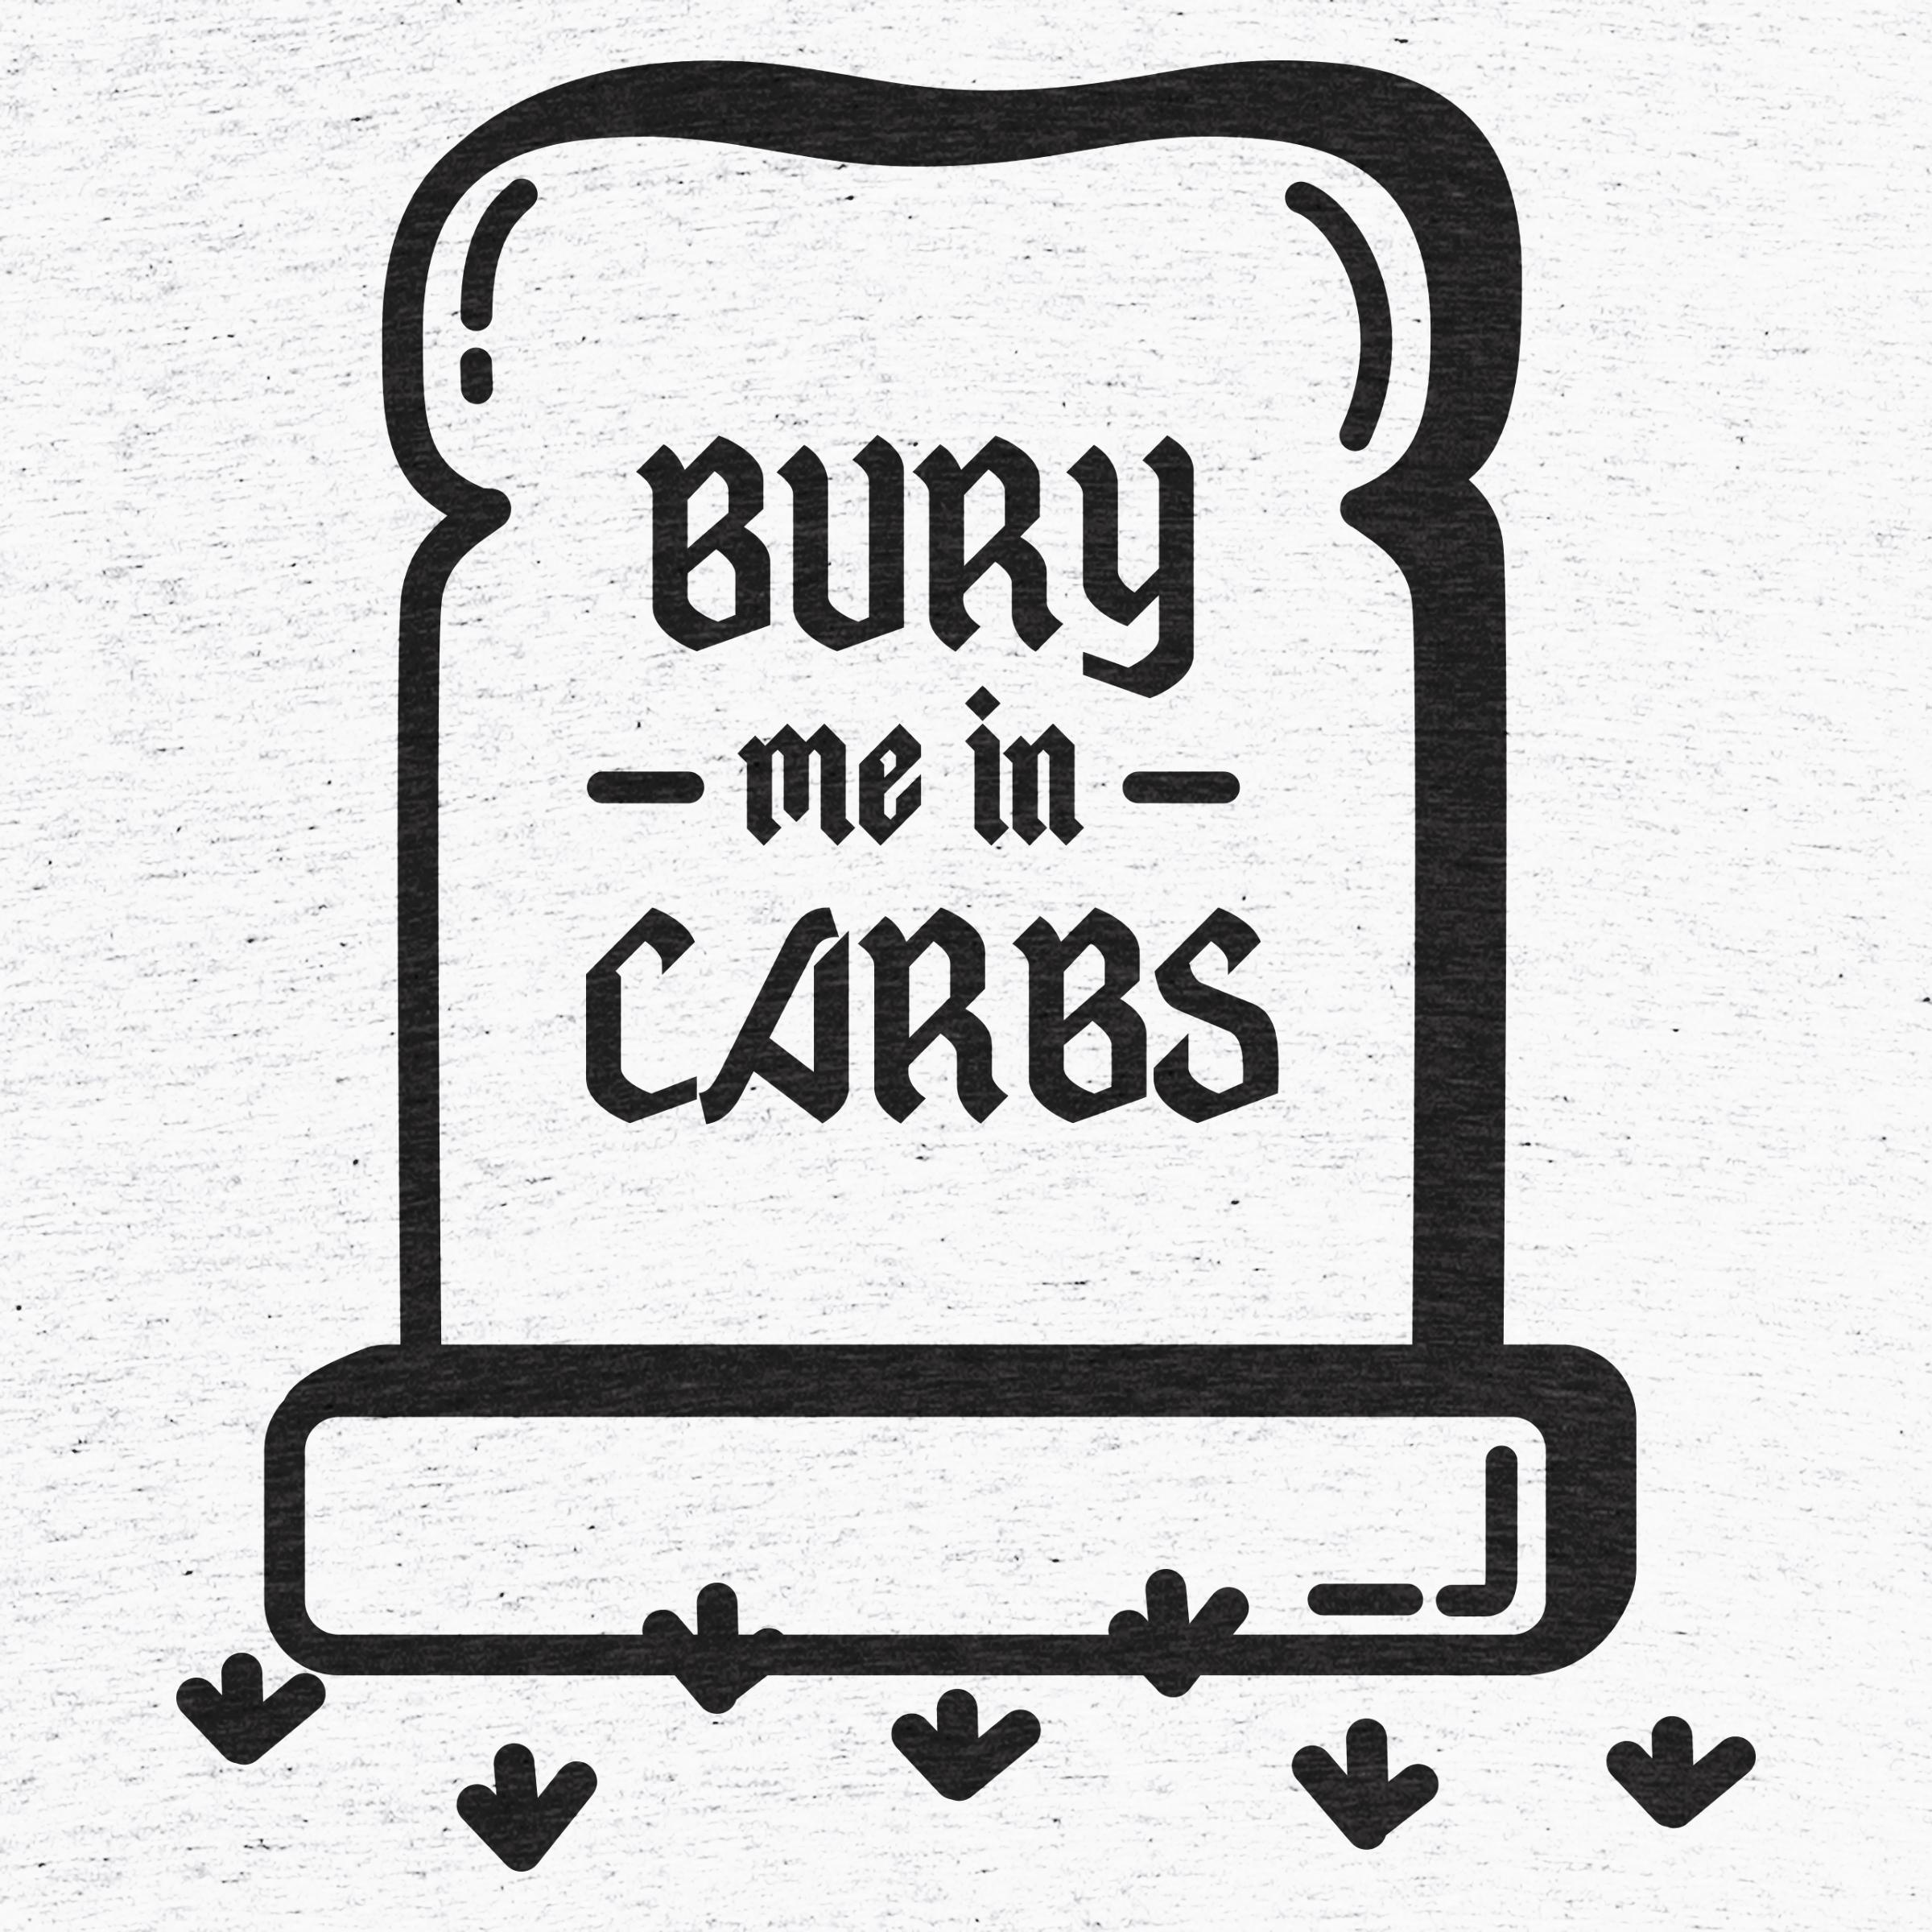 Bury Me In Carbs